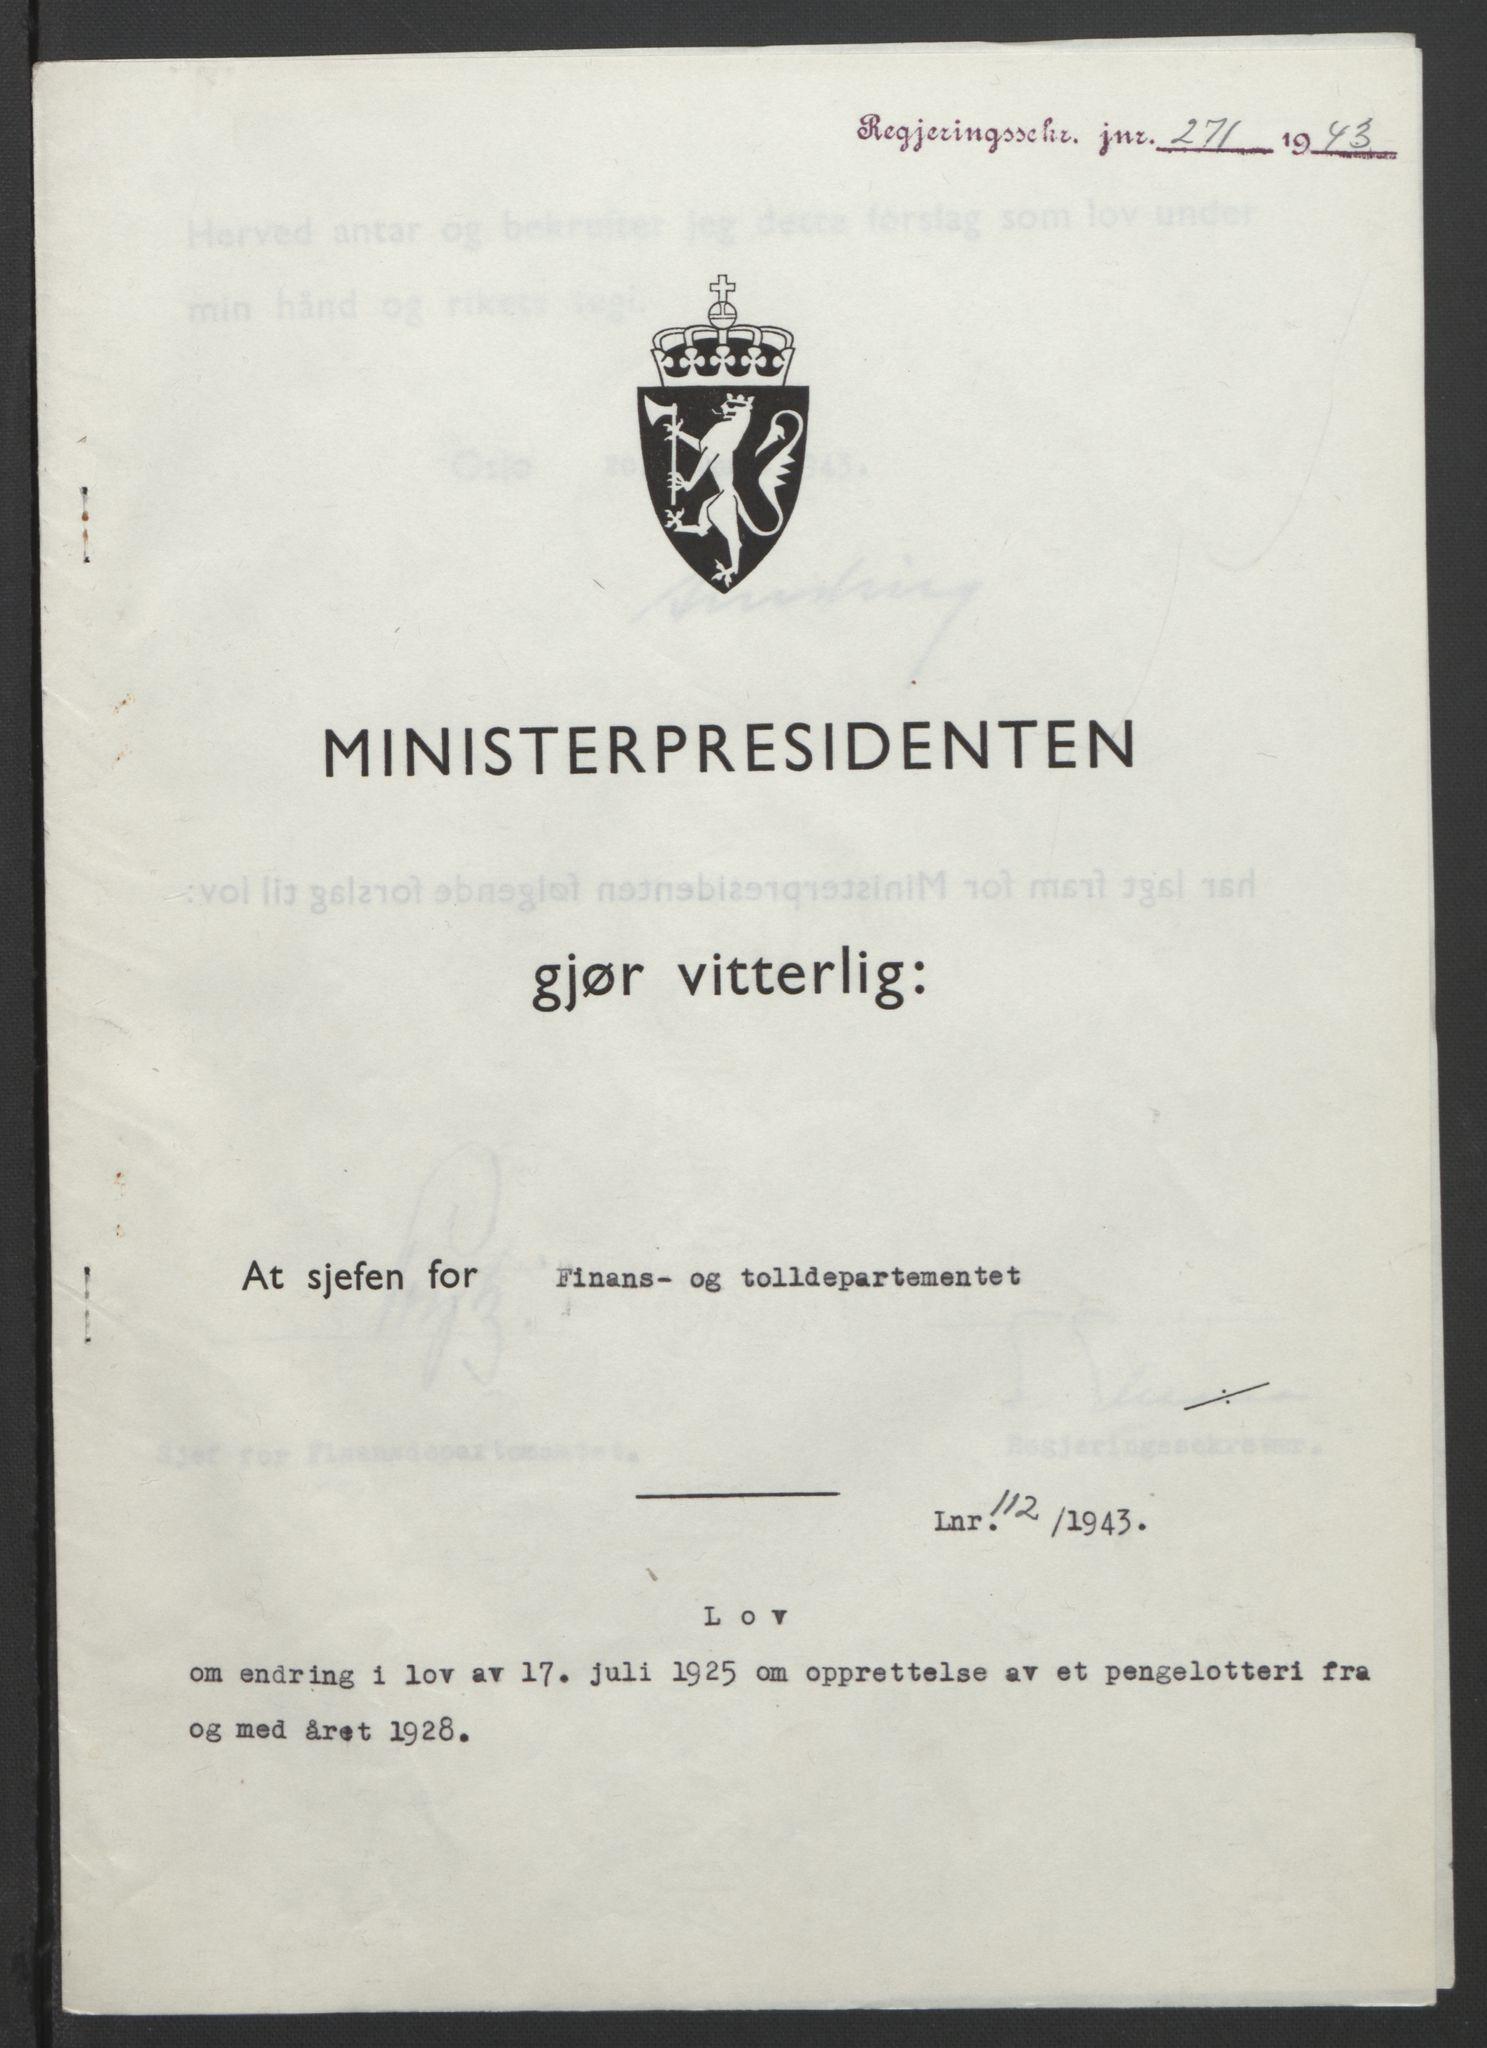 RA, NS-administrasjonen 1940-1945 (Statsrådsekretariatet, de kommisariske statsråder mm), D/Db/L0099: Lover, 1943, s. 523